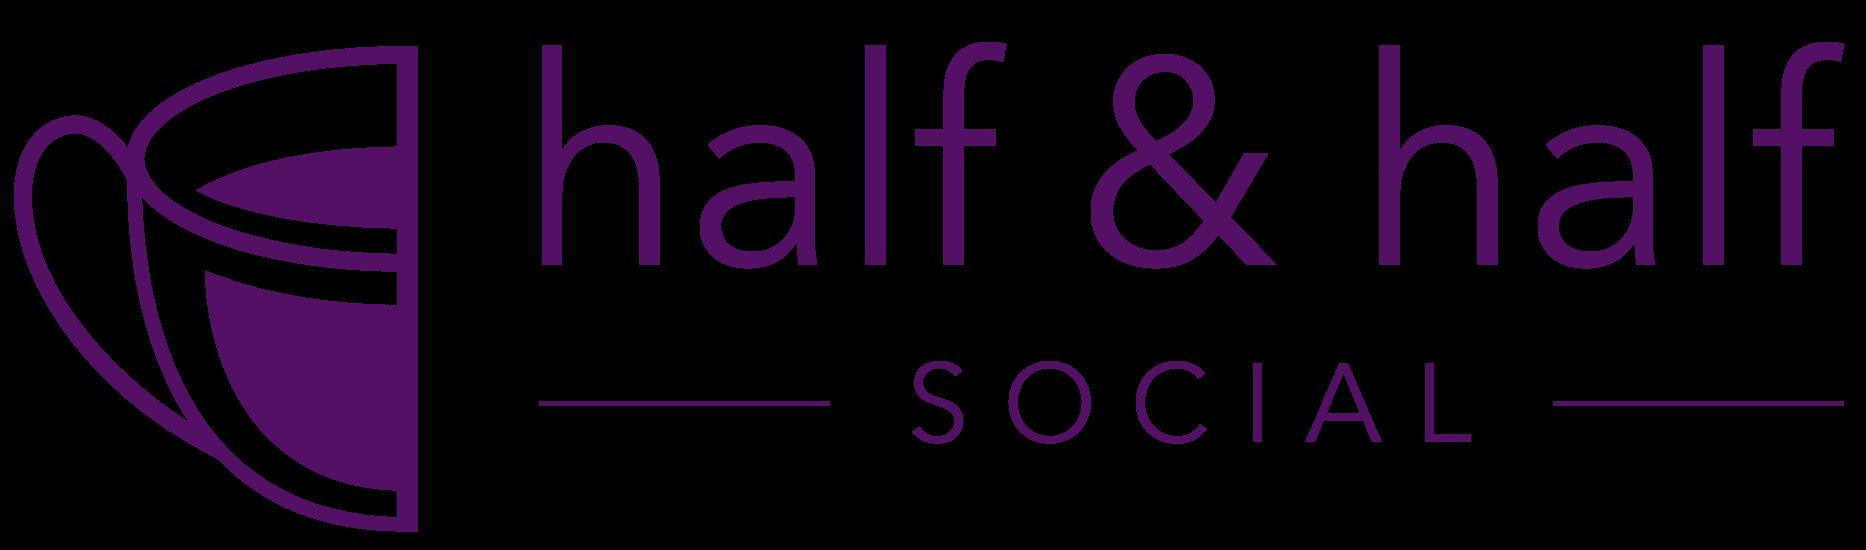 Half & Half Social Media Lifestyle